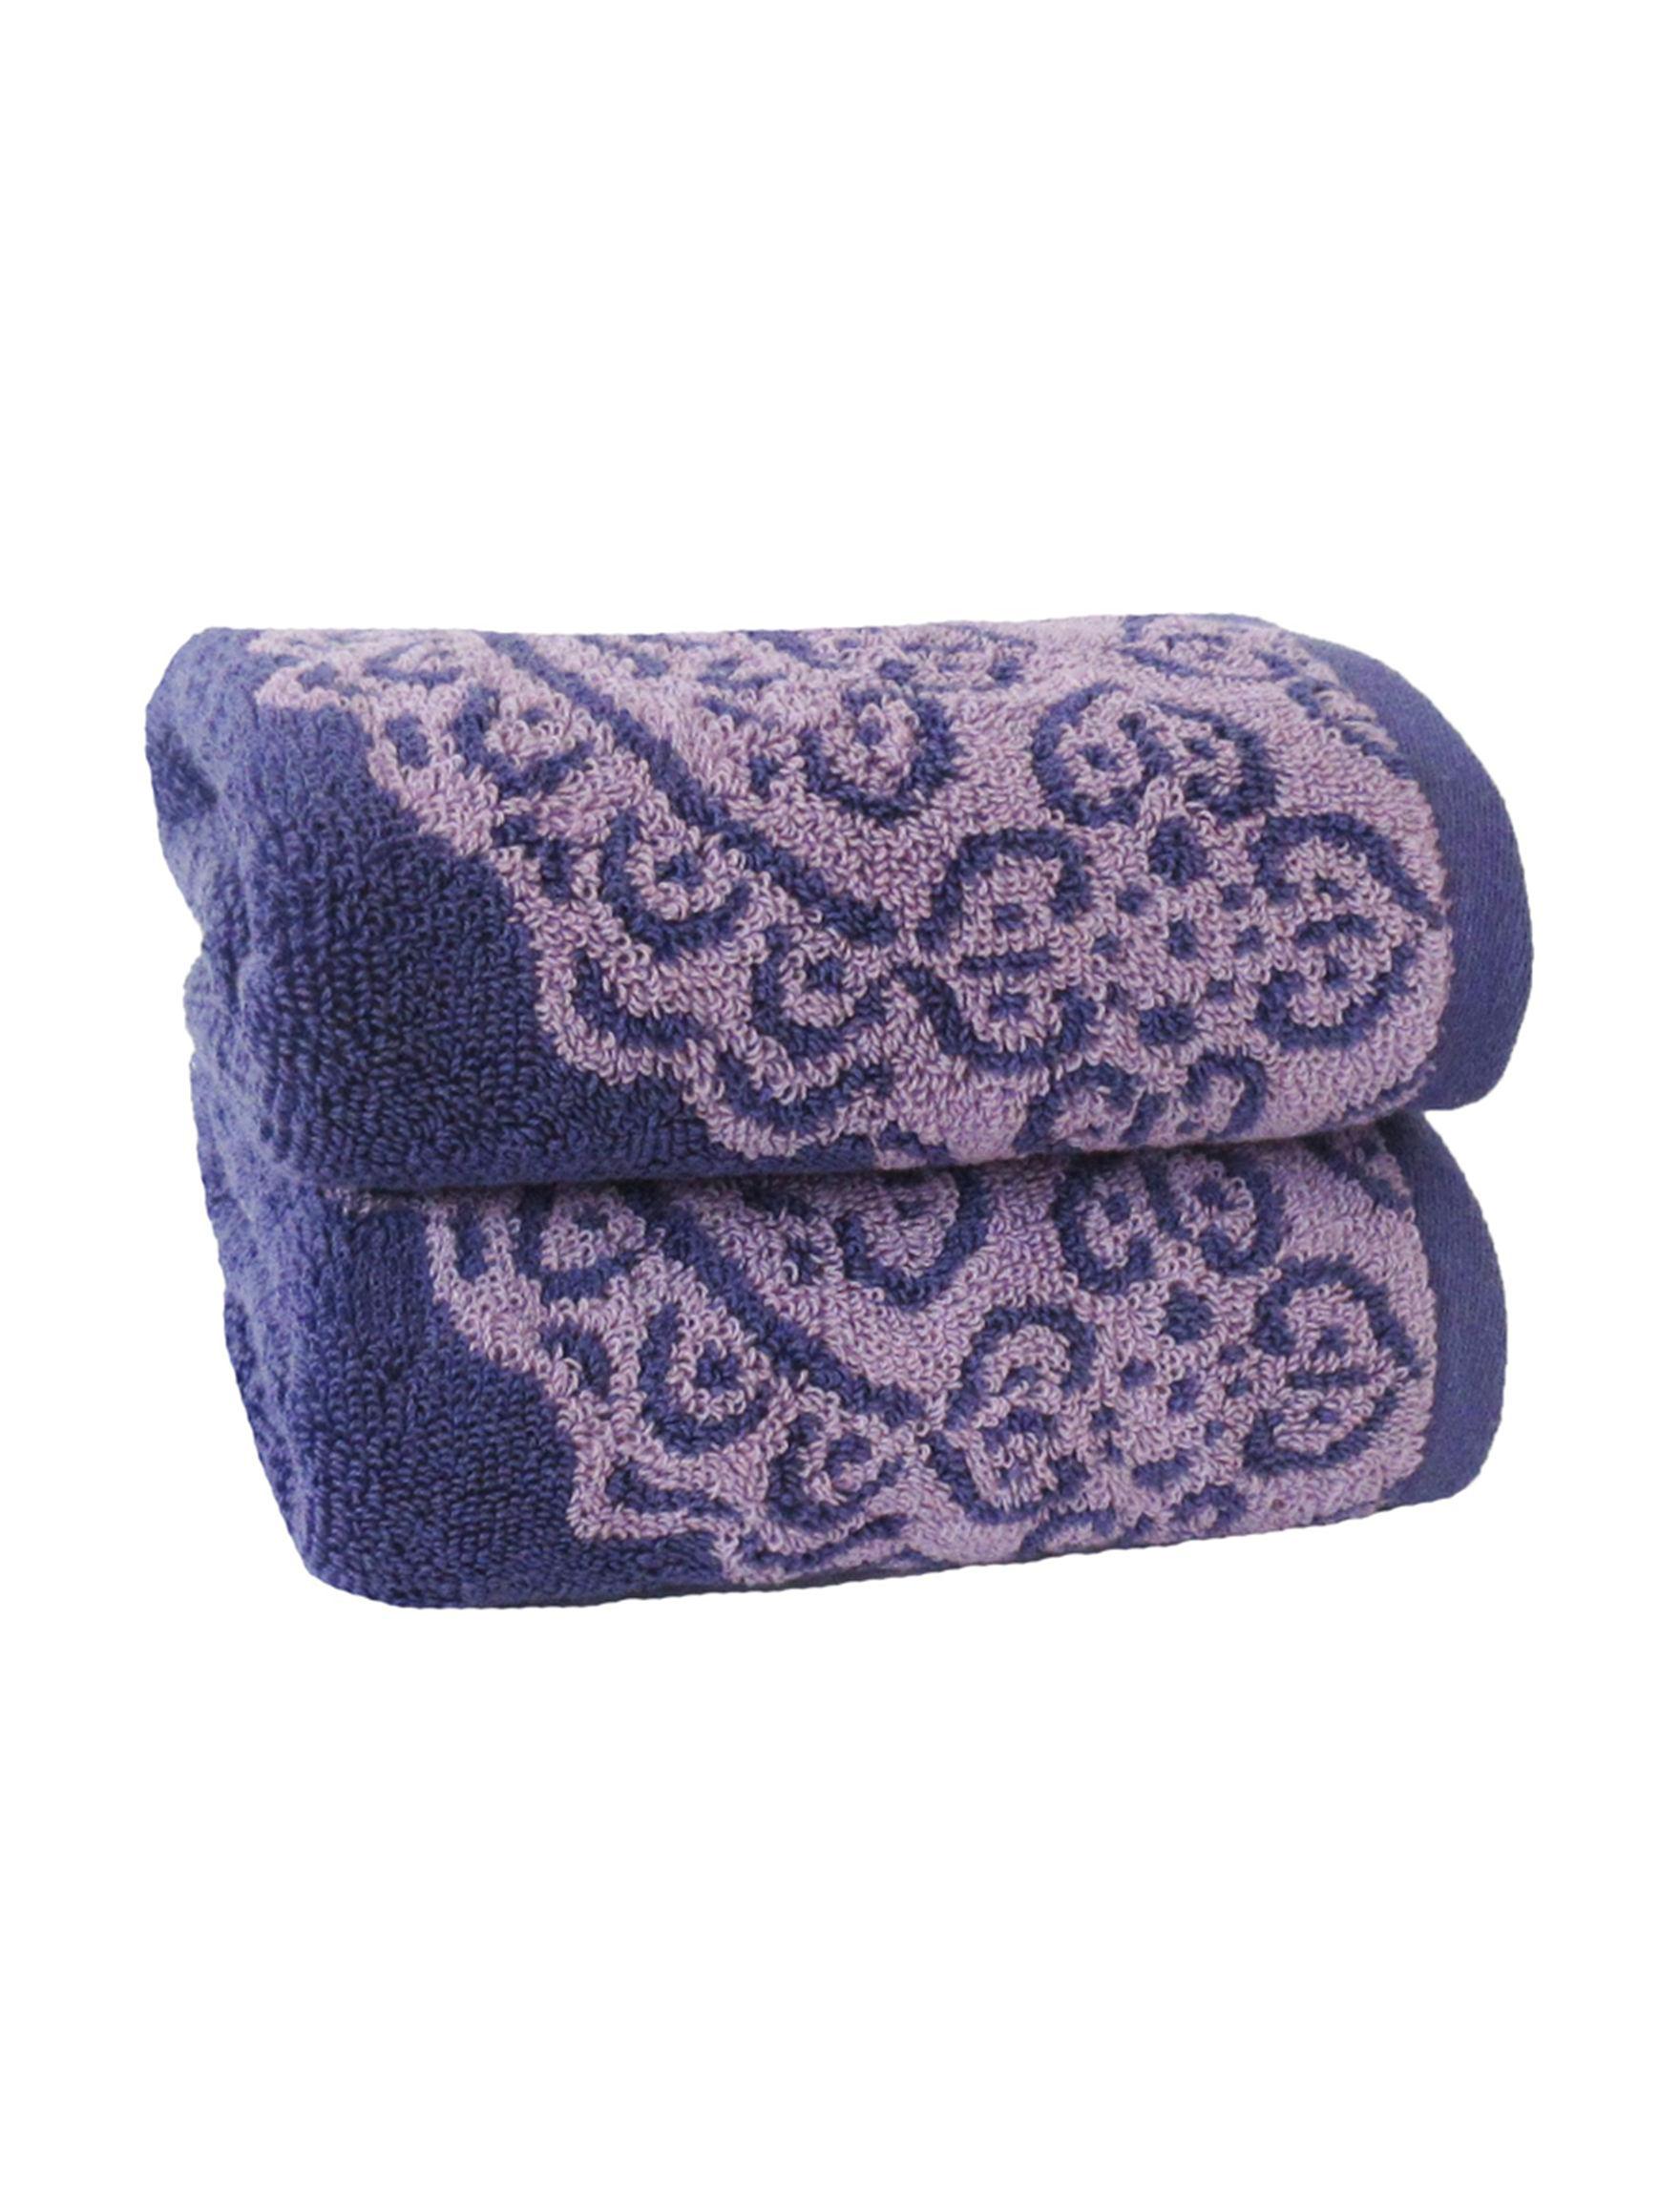 Jessica Simpson Purple Bath Towels Towels